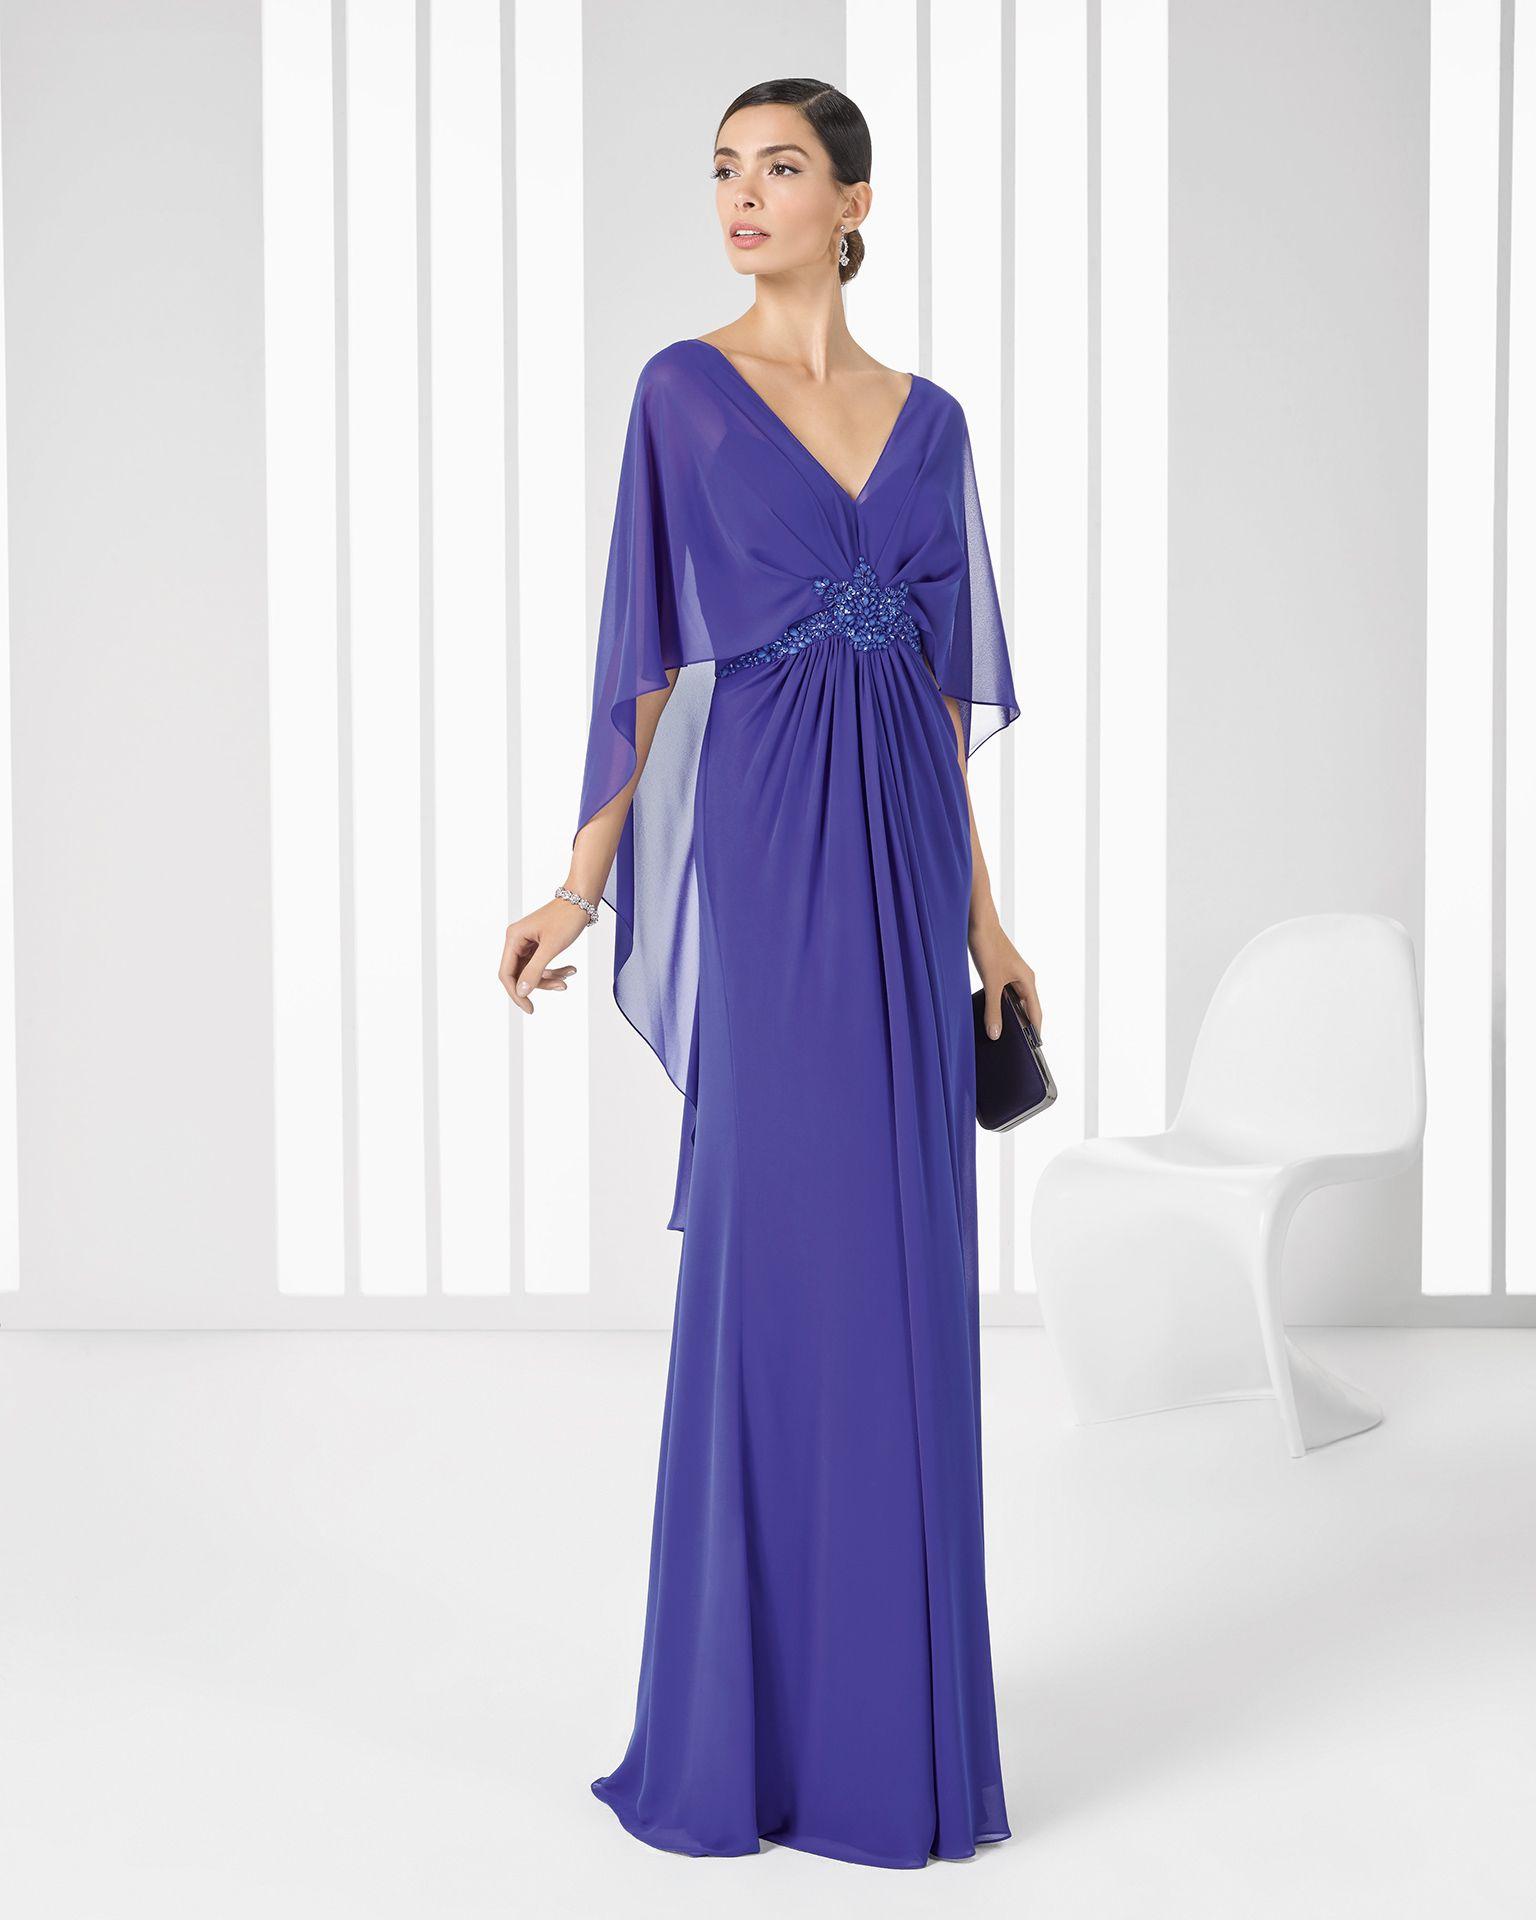 Vestido morado con tapado incluido. Código: 9T158 | Moda | Pinterest ...